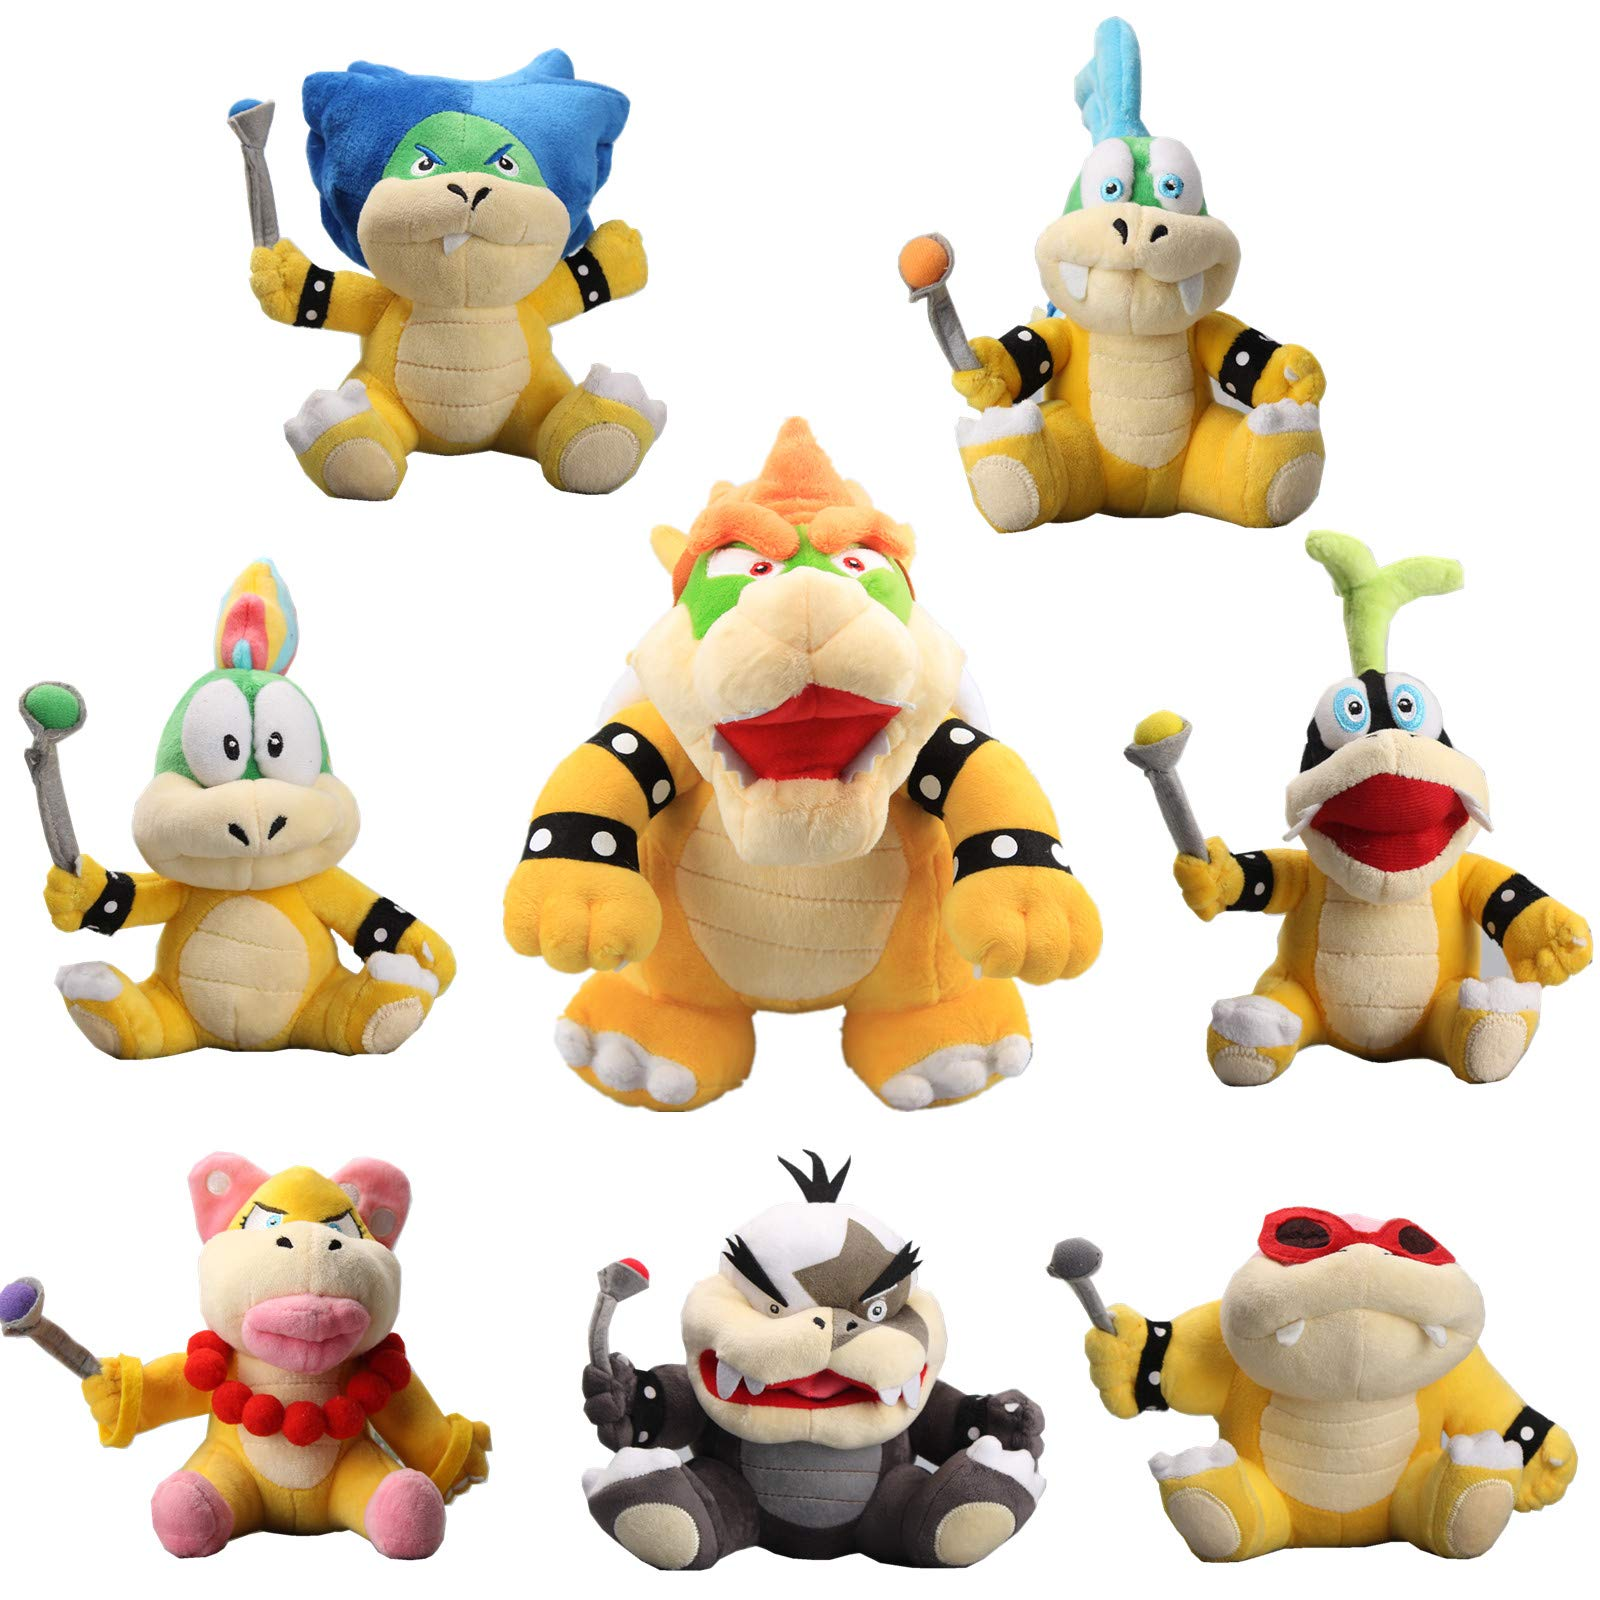 uiuoutoy Super Mario 10'' King Bowser & Koopalings Larry Iggy Lemmy Roy Ludwig Wendy Morton Koopa Plush Set of 8 pcs by uiuoutoy